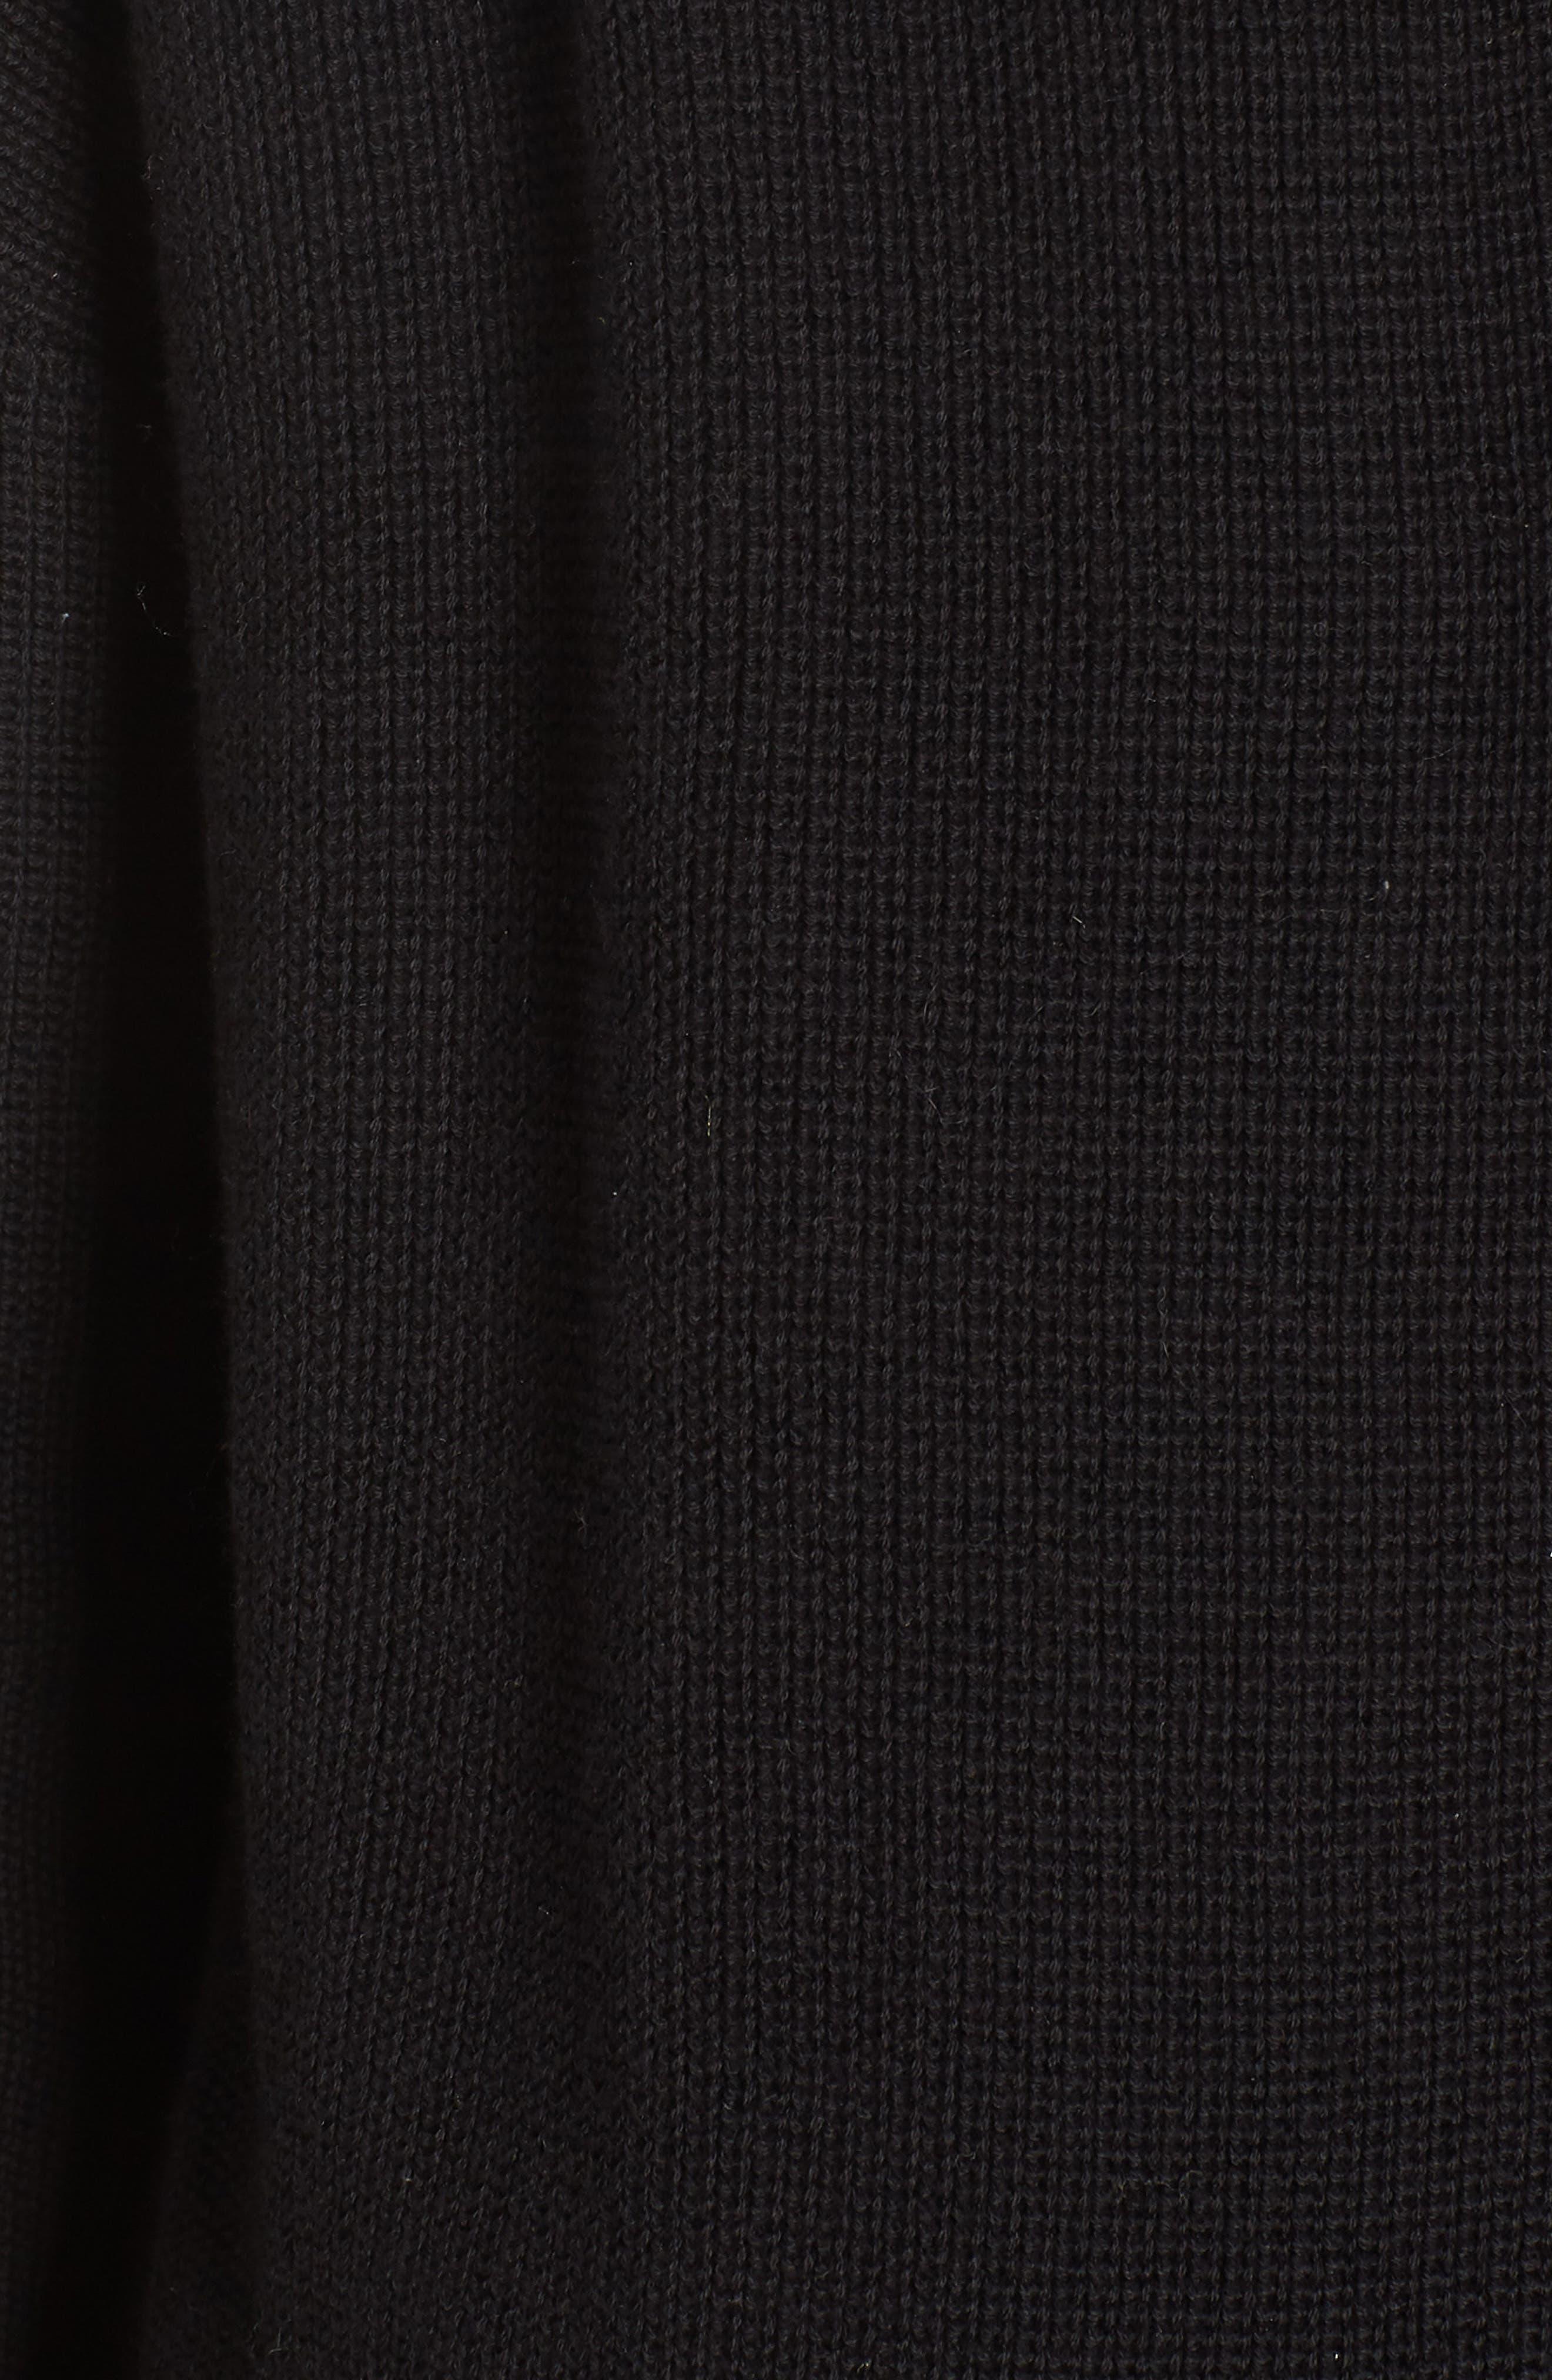 Stitch Curve Hem Cardigan,                             Alternate thumbnail 6, color,                             Black